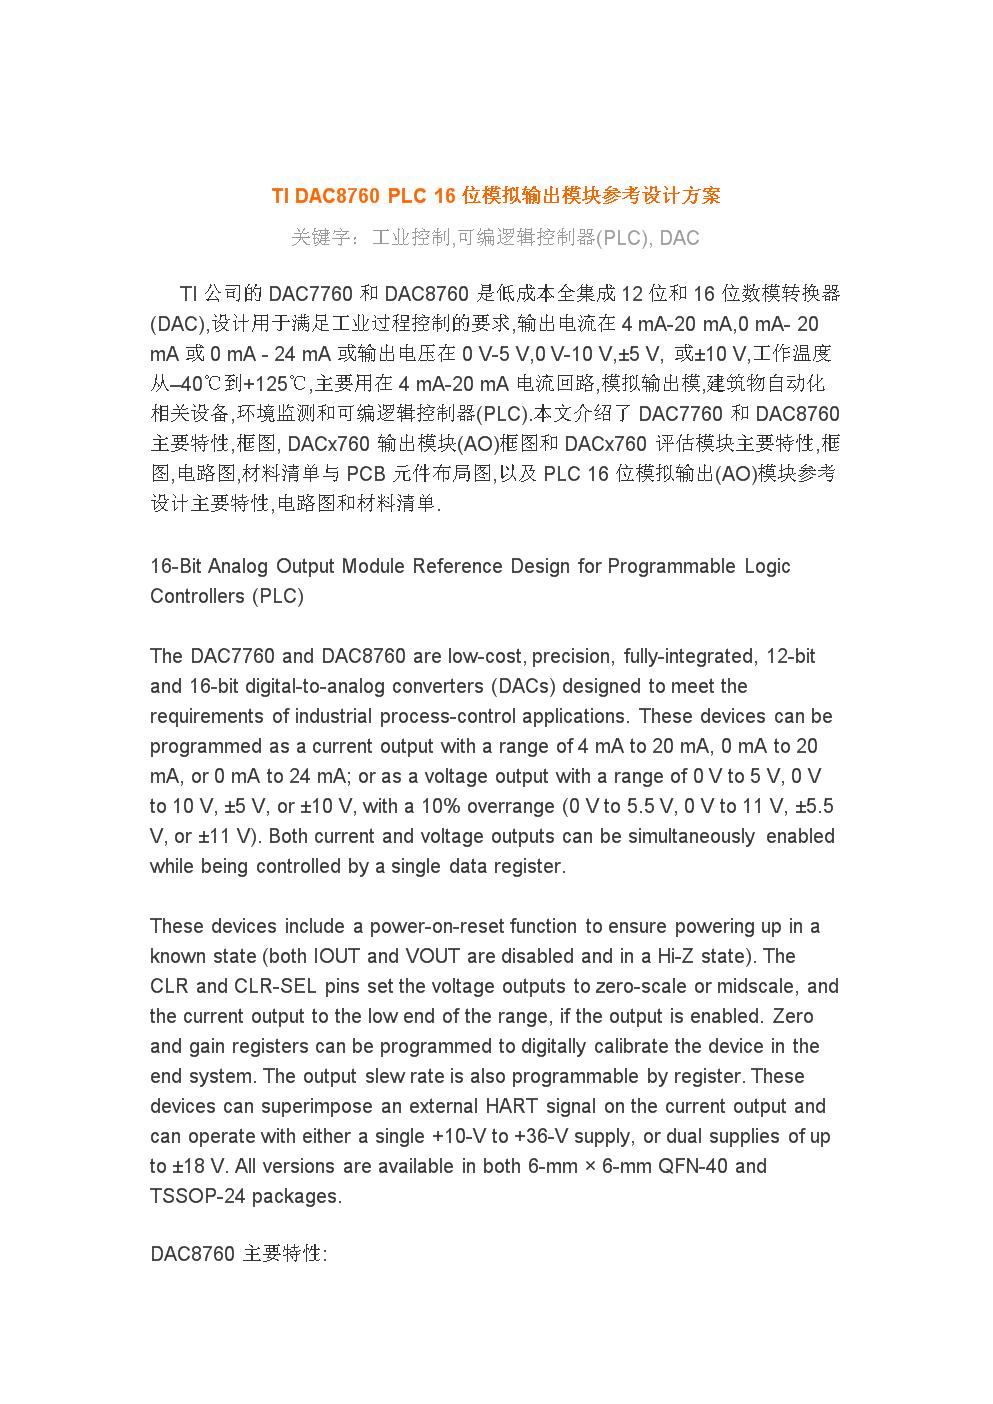 tidac8760plc16位模拟输出模块参考设计方案.docx